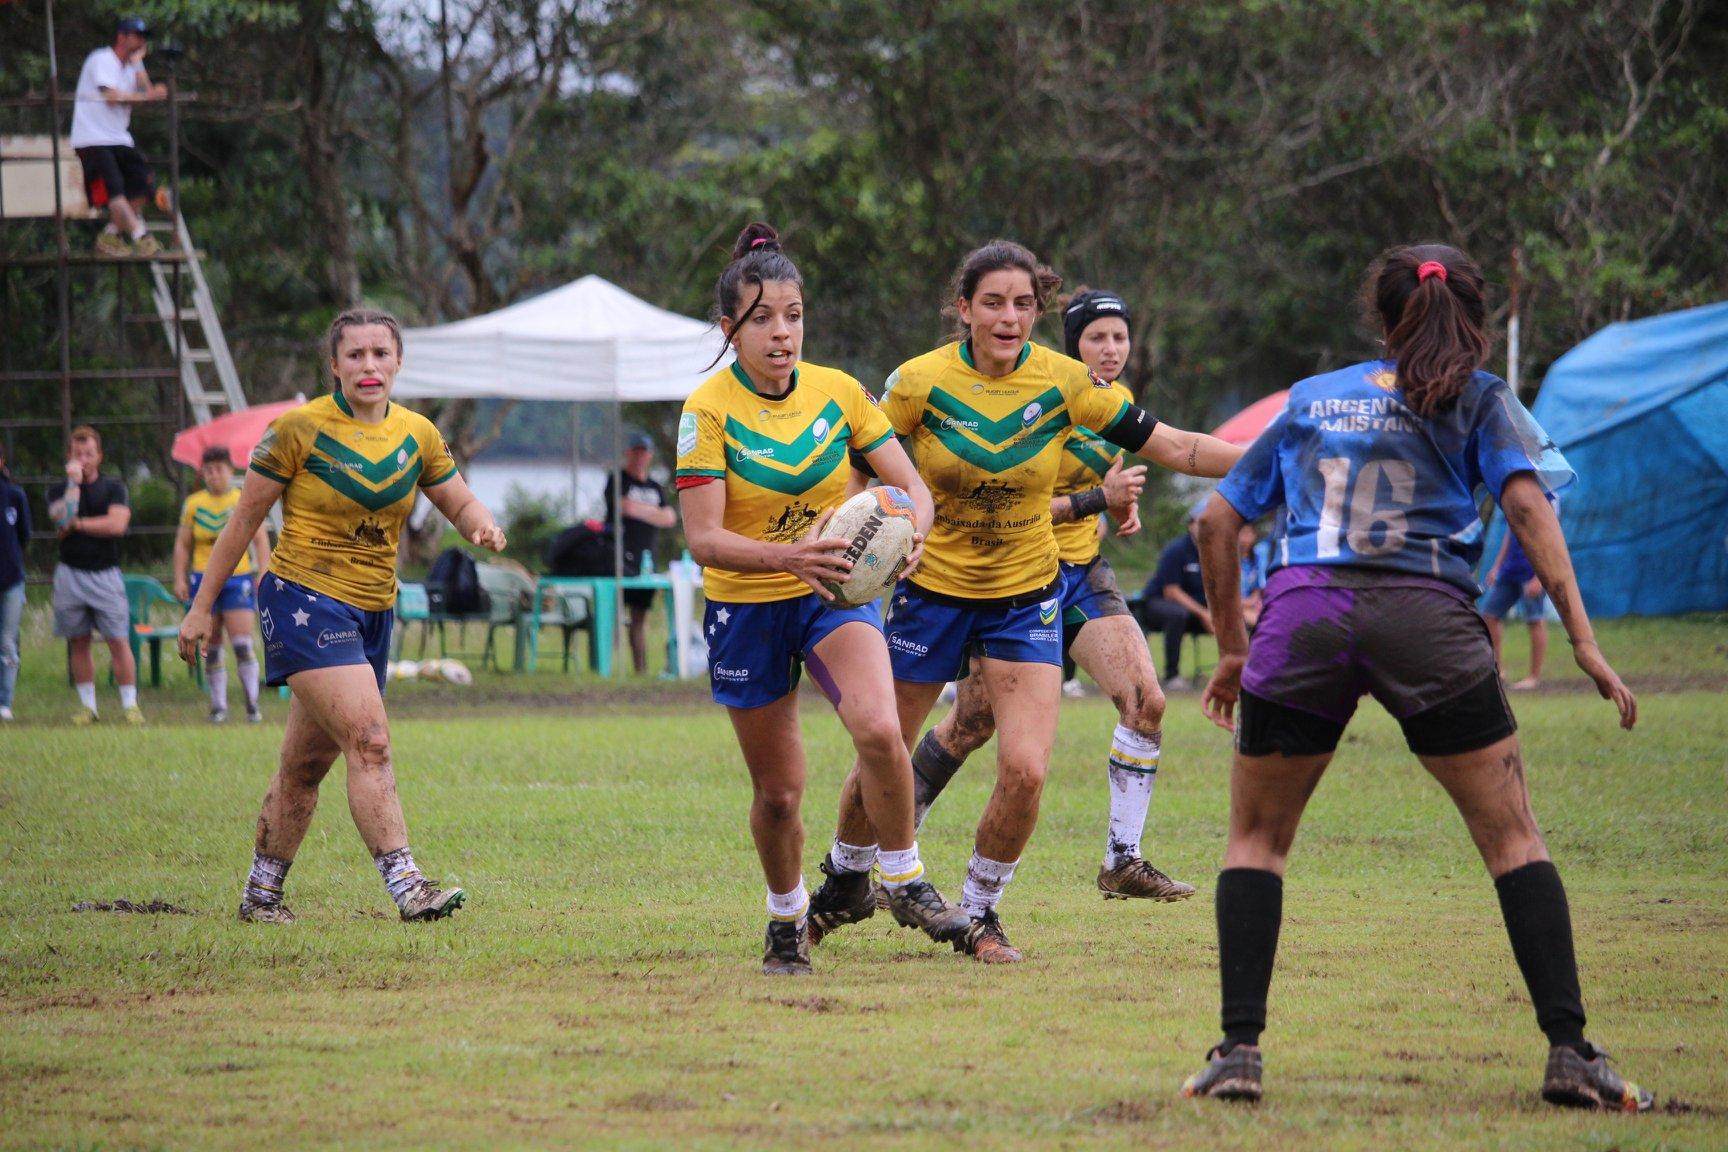 Brasil, Chile Rugby League dealt COVID-19 blow